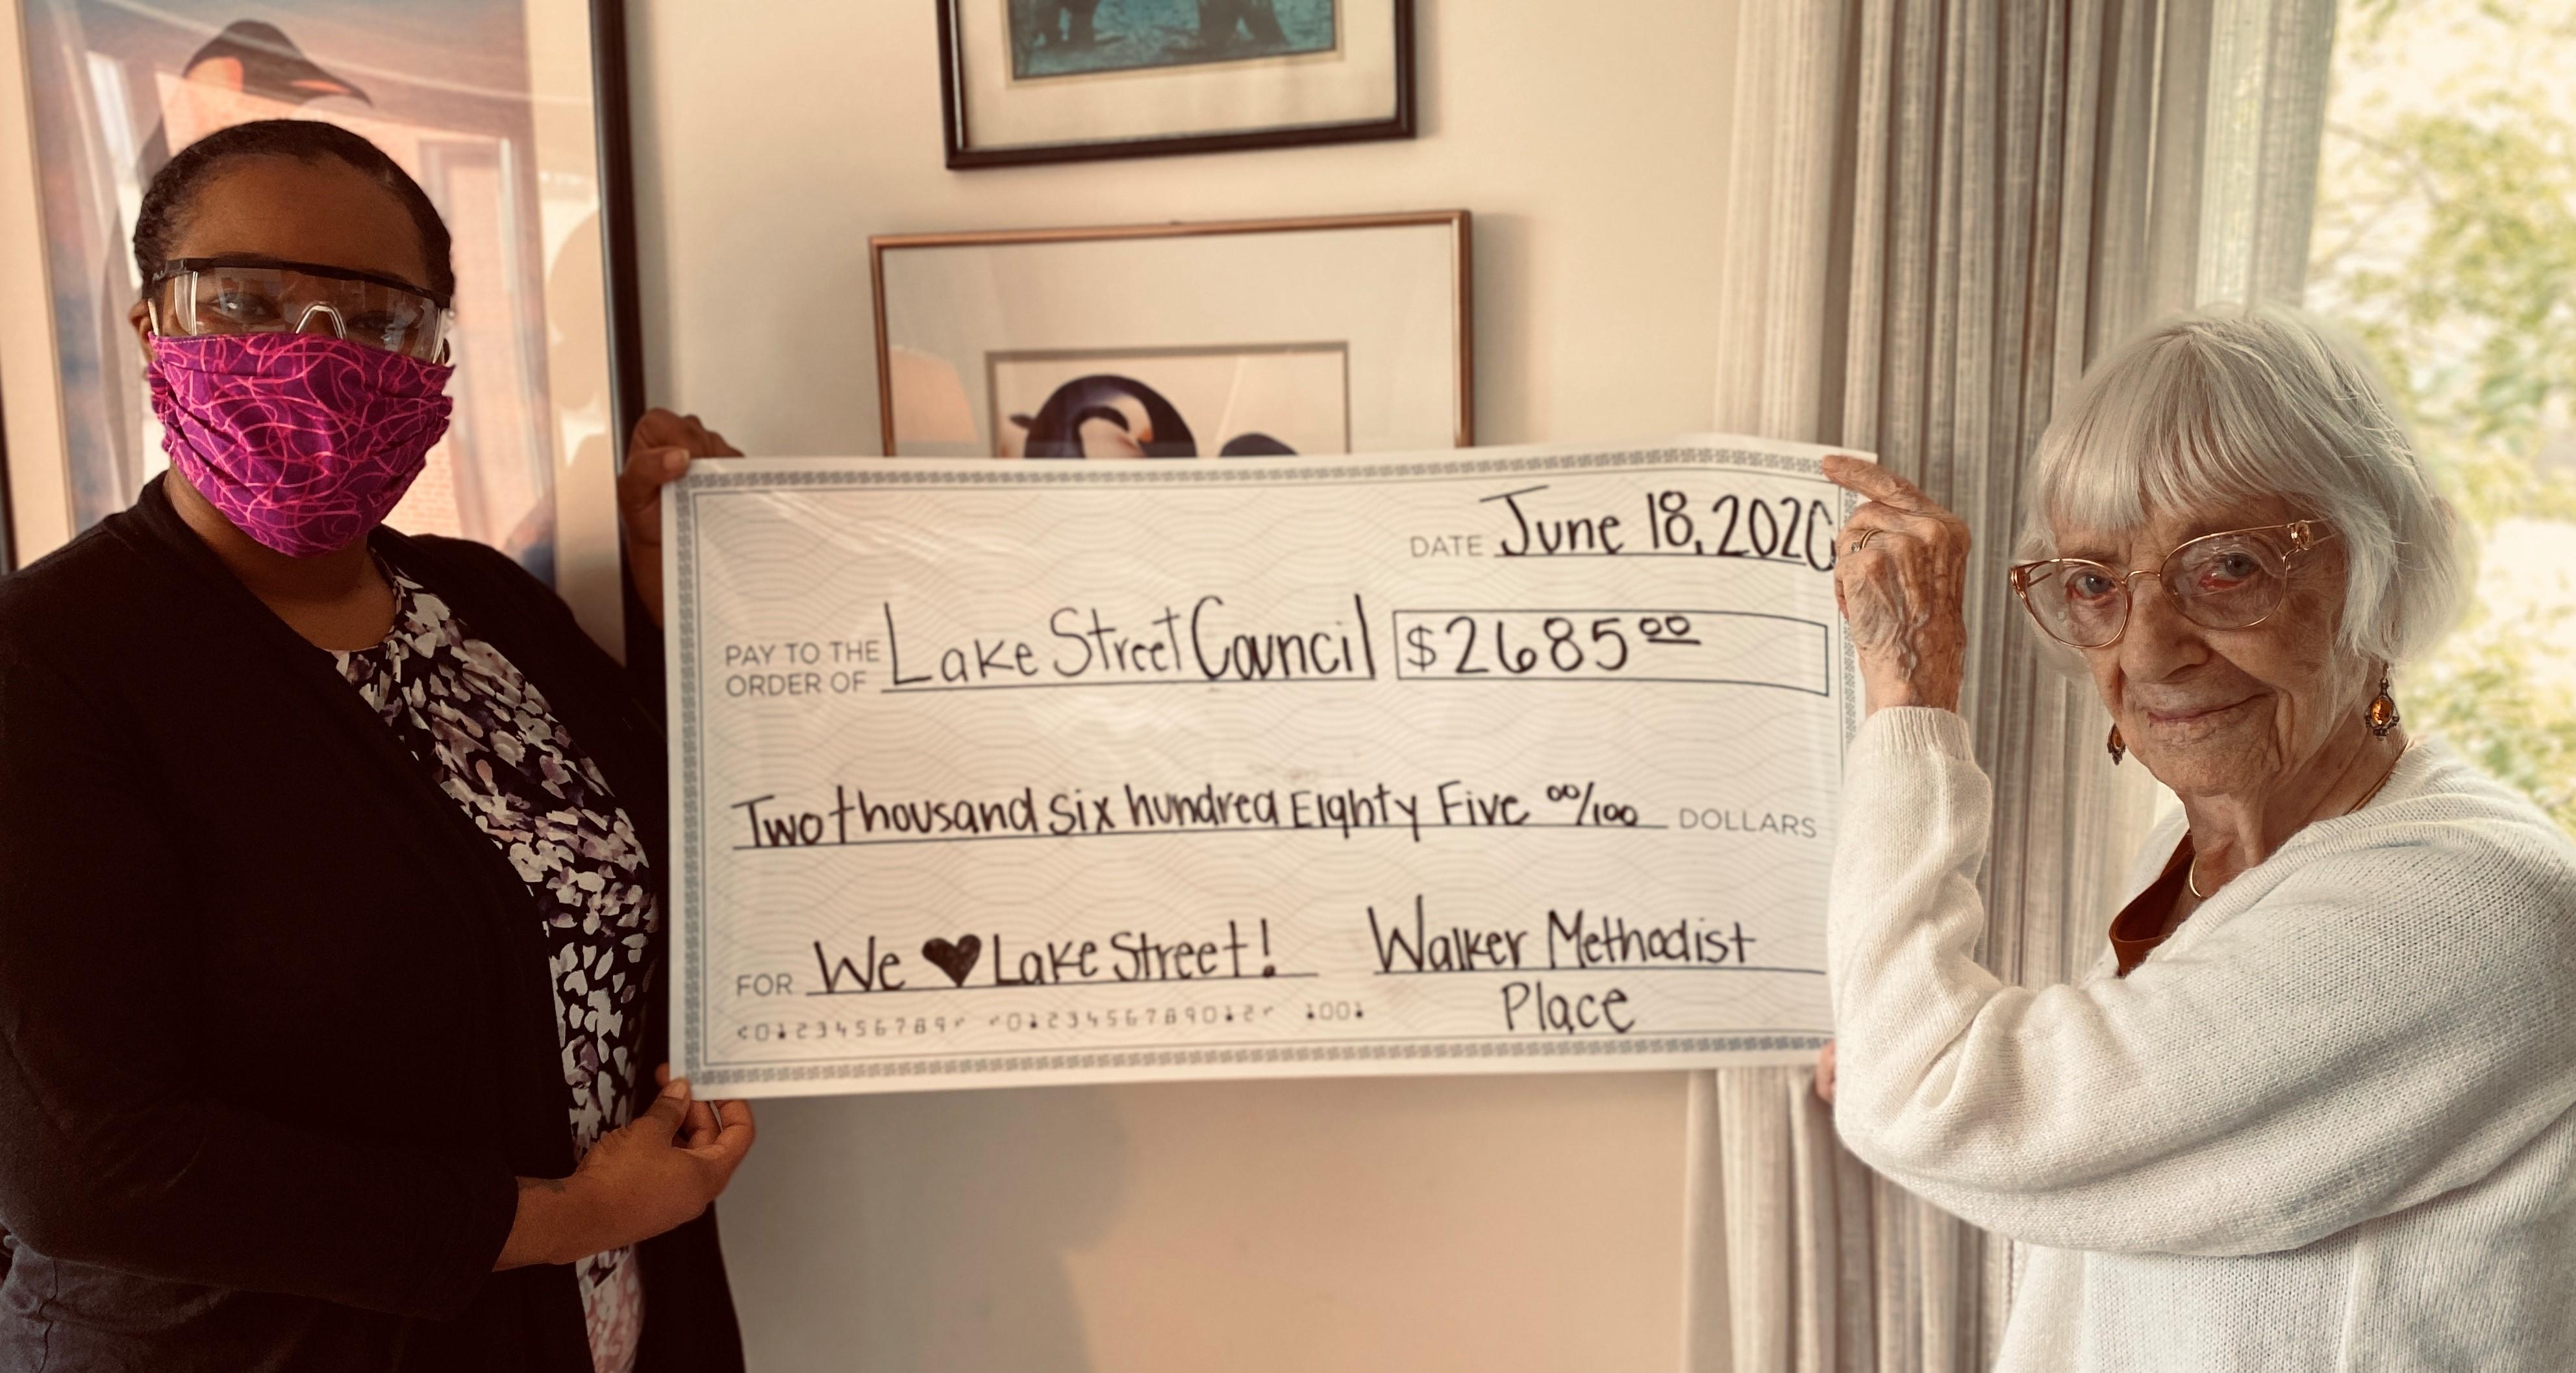 Residents raise more than $2,600 to help Minneapolis